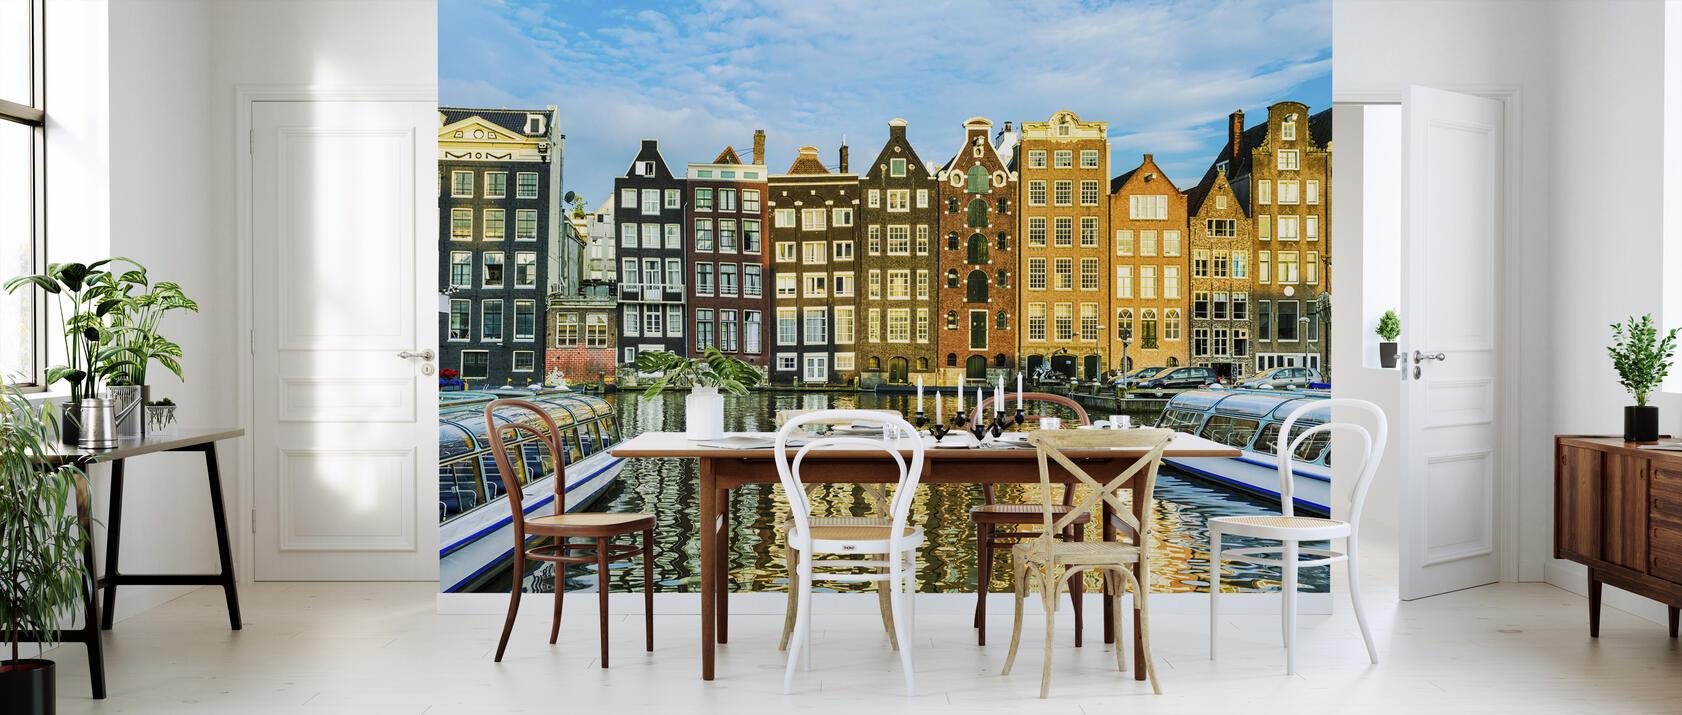 traditional houses of amsterdam netherlands fototapete. Black Bedroom Furniture Sets. Home Design Ideas